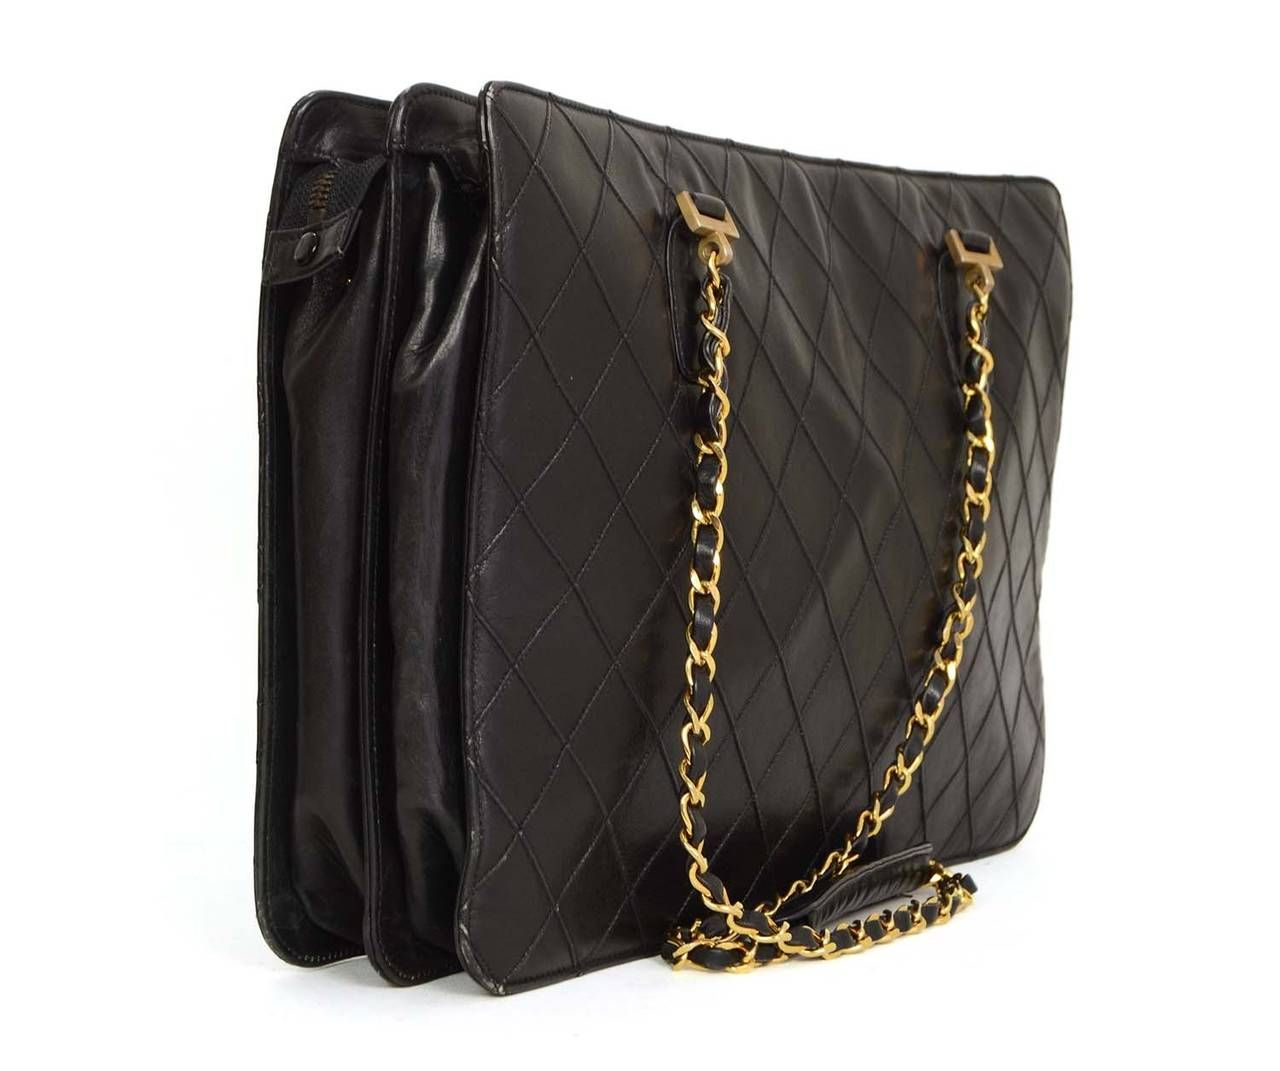 c3bceb04309d CHANEL Vintage 80 s Black Quilted Leather Shopper Tote Bag GHW